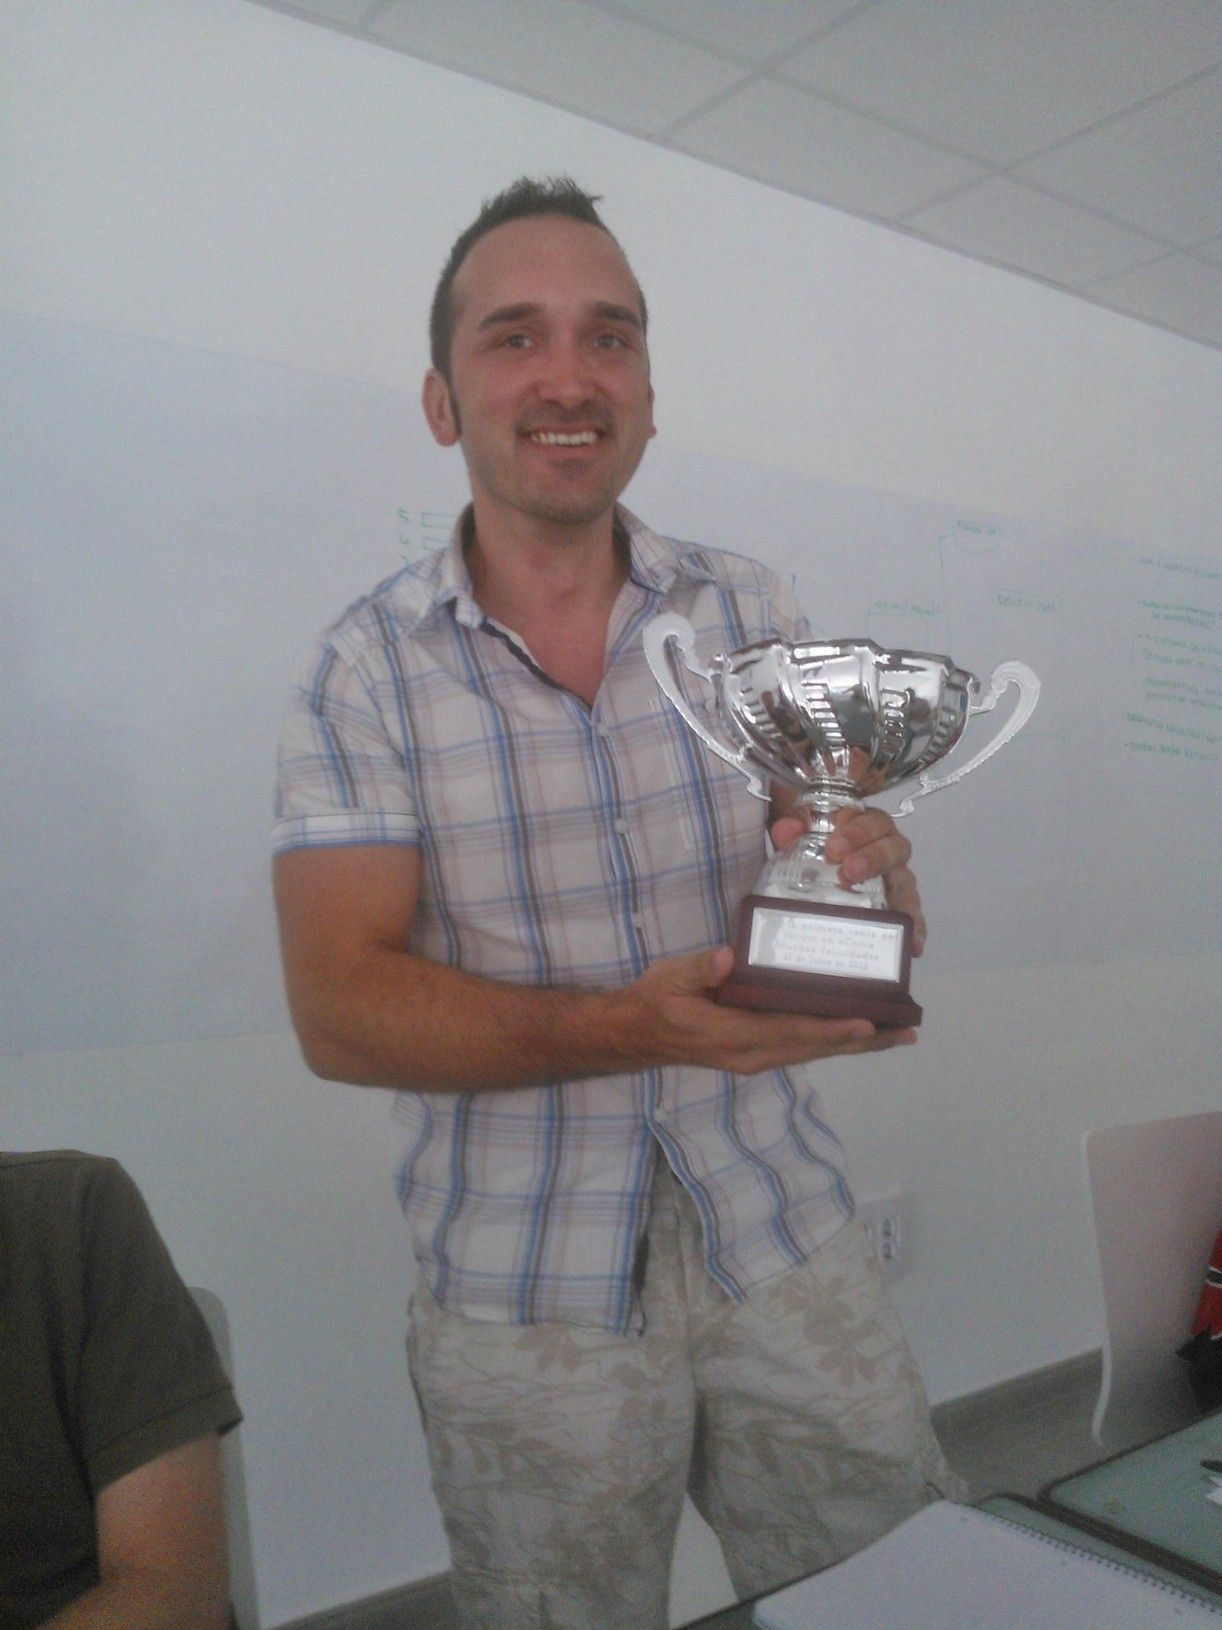 Congratulations to Andrés, our Top Verum Trustmark Salesman!